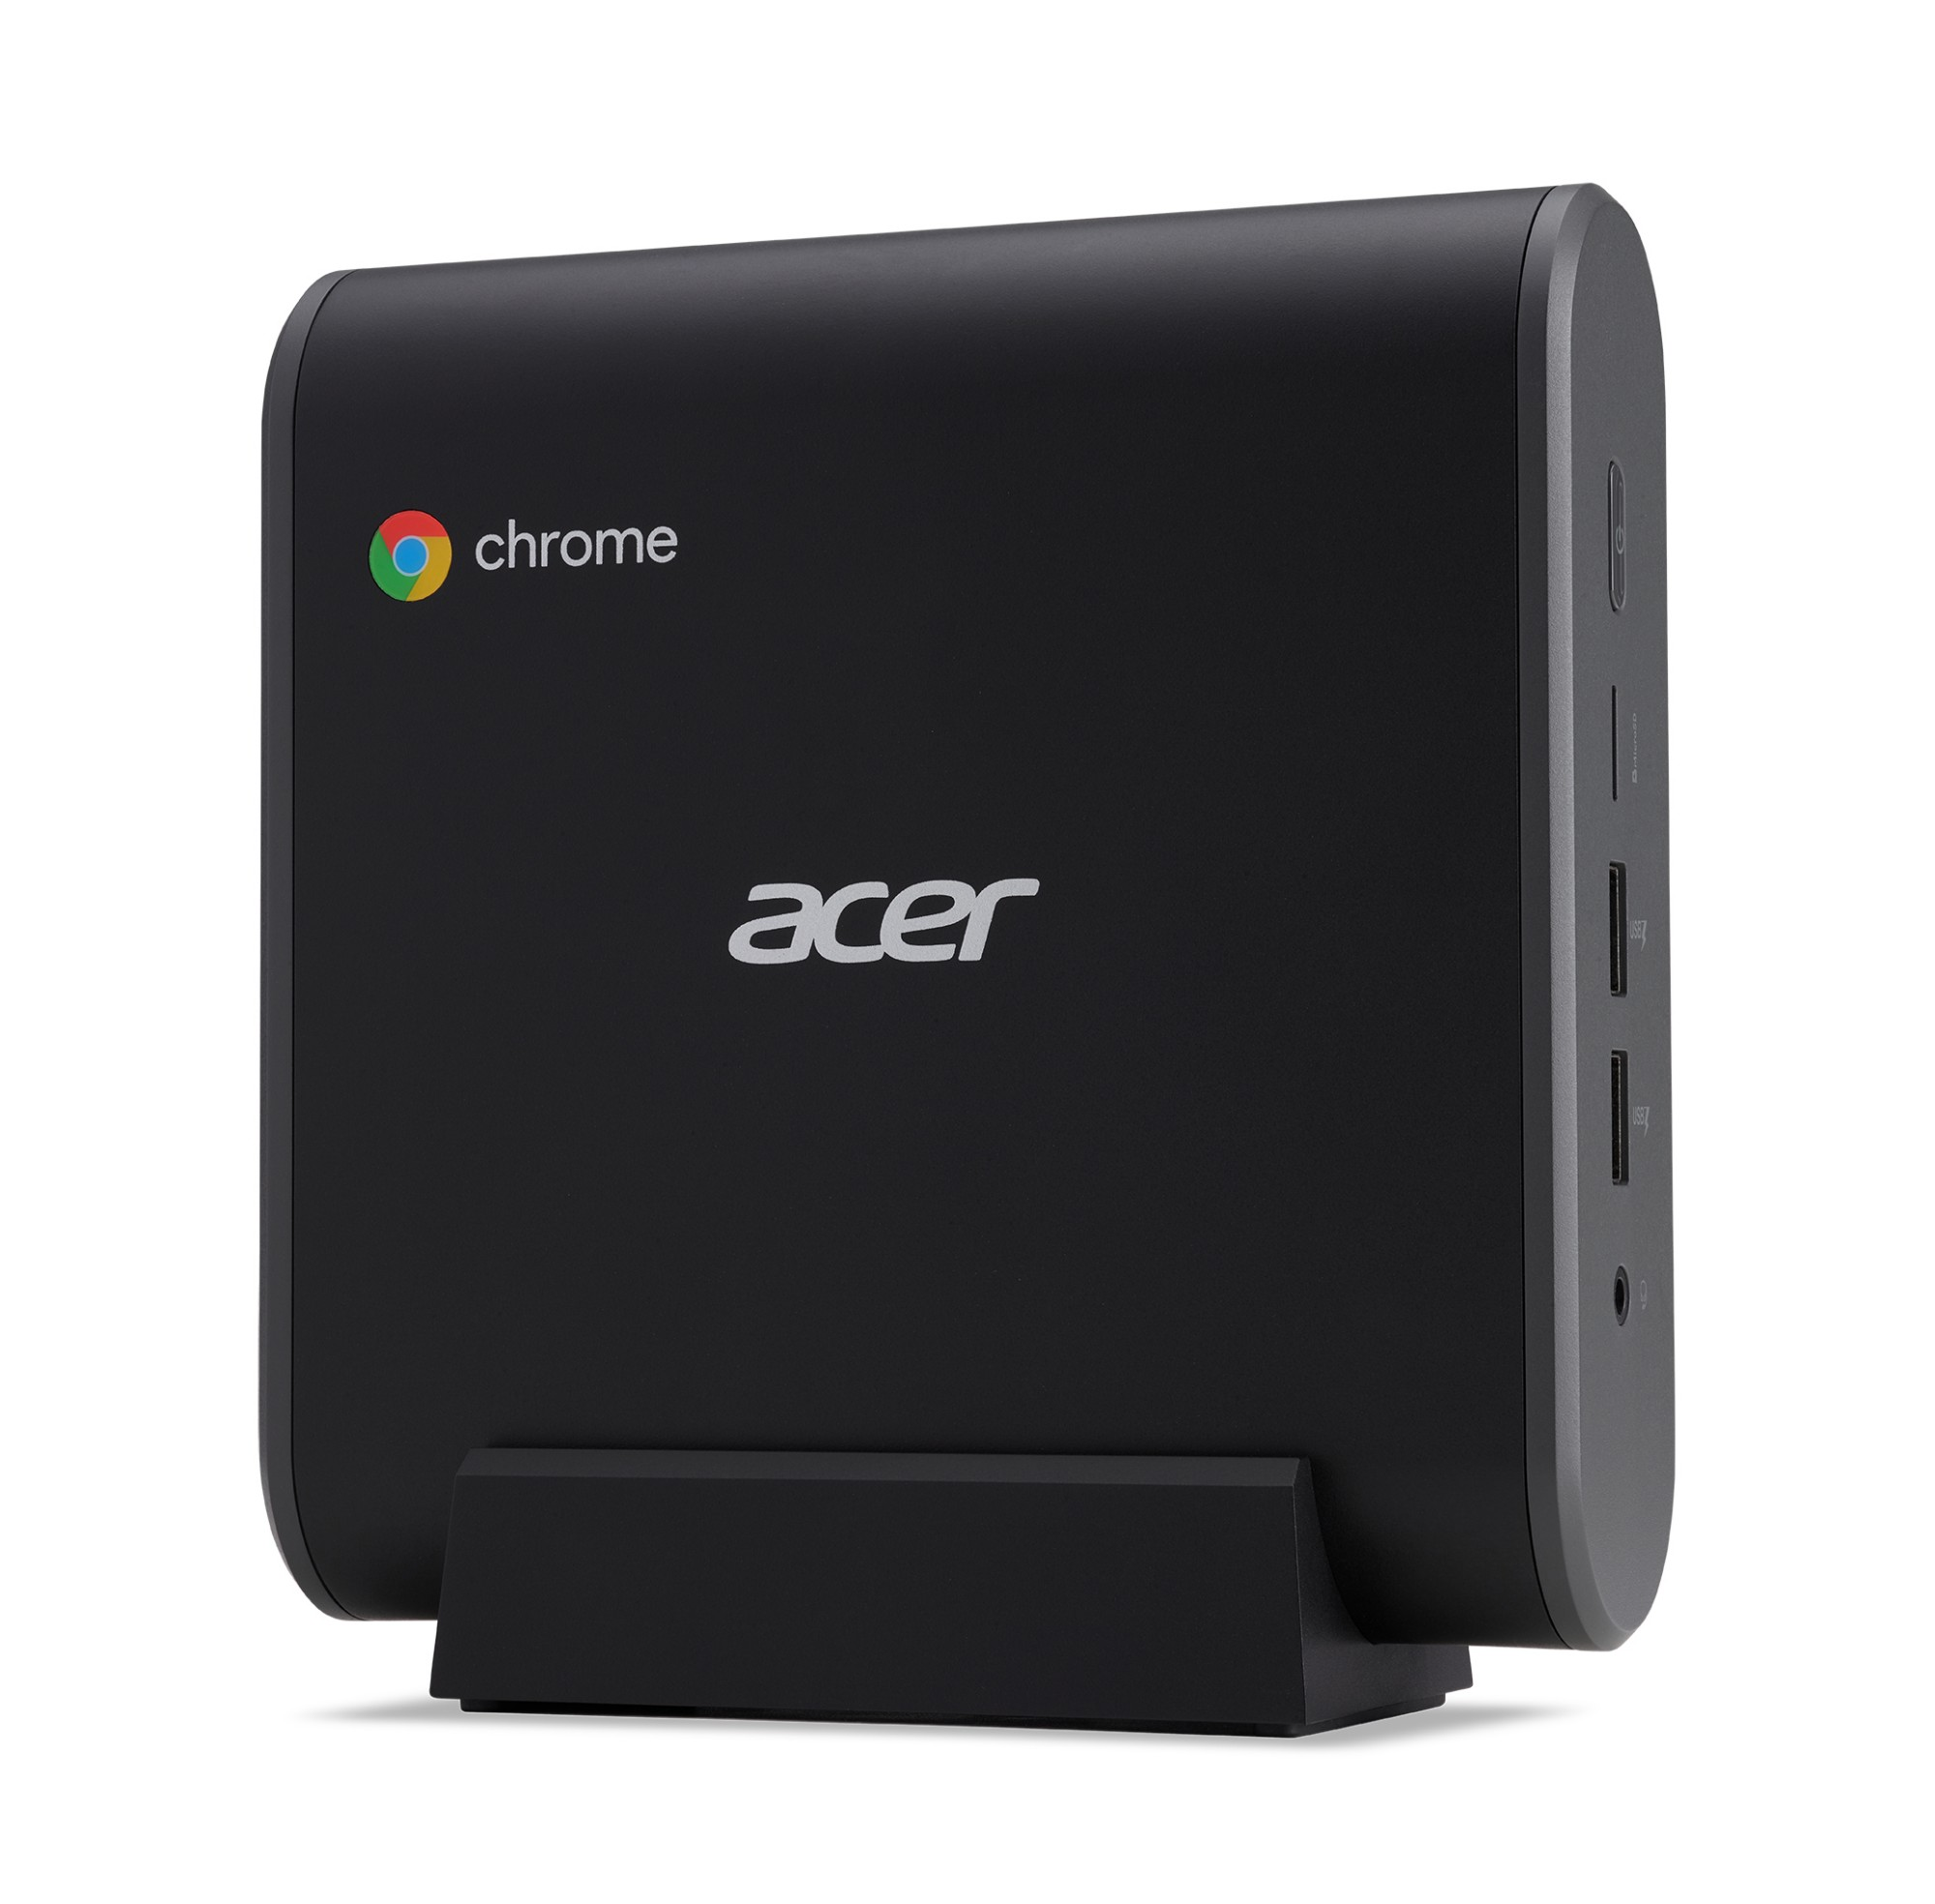 Acer Chromebox CXI3 8ª generación de procesadores Intel® Core™ i3 i3-8130U 4 GB DDR4-SDRAM 32 GB SSD mini PC Negro Chrome OS